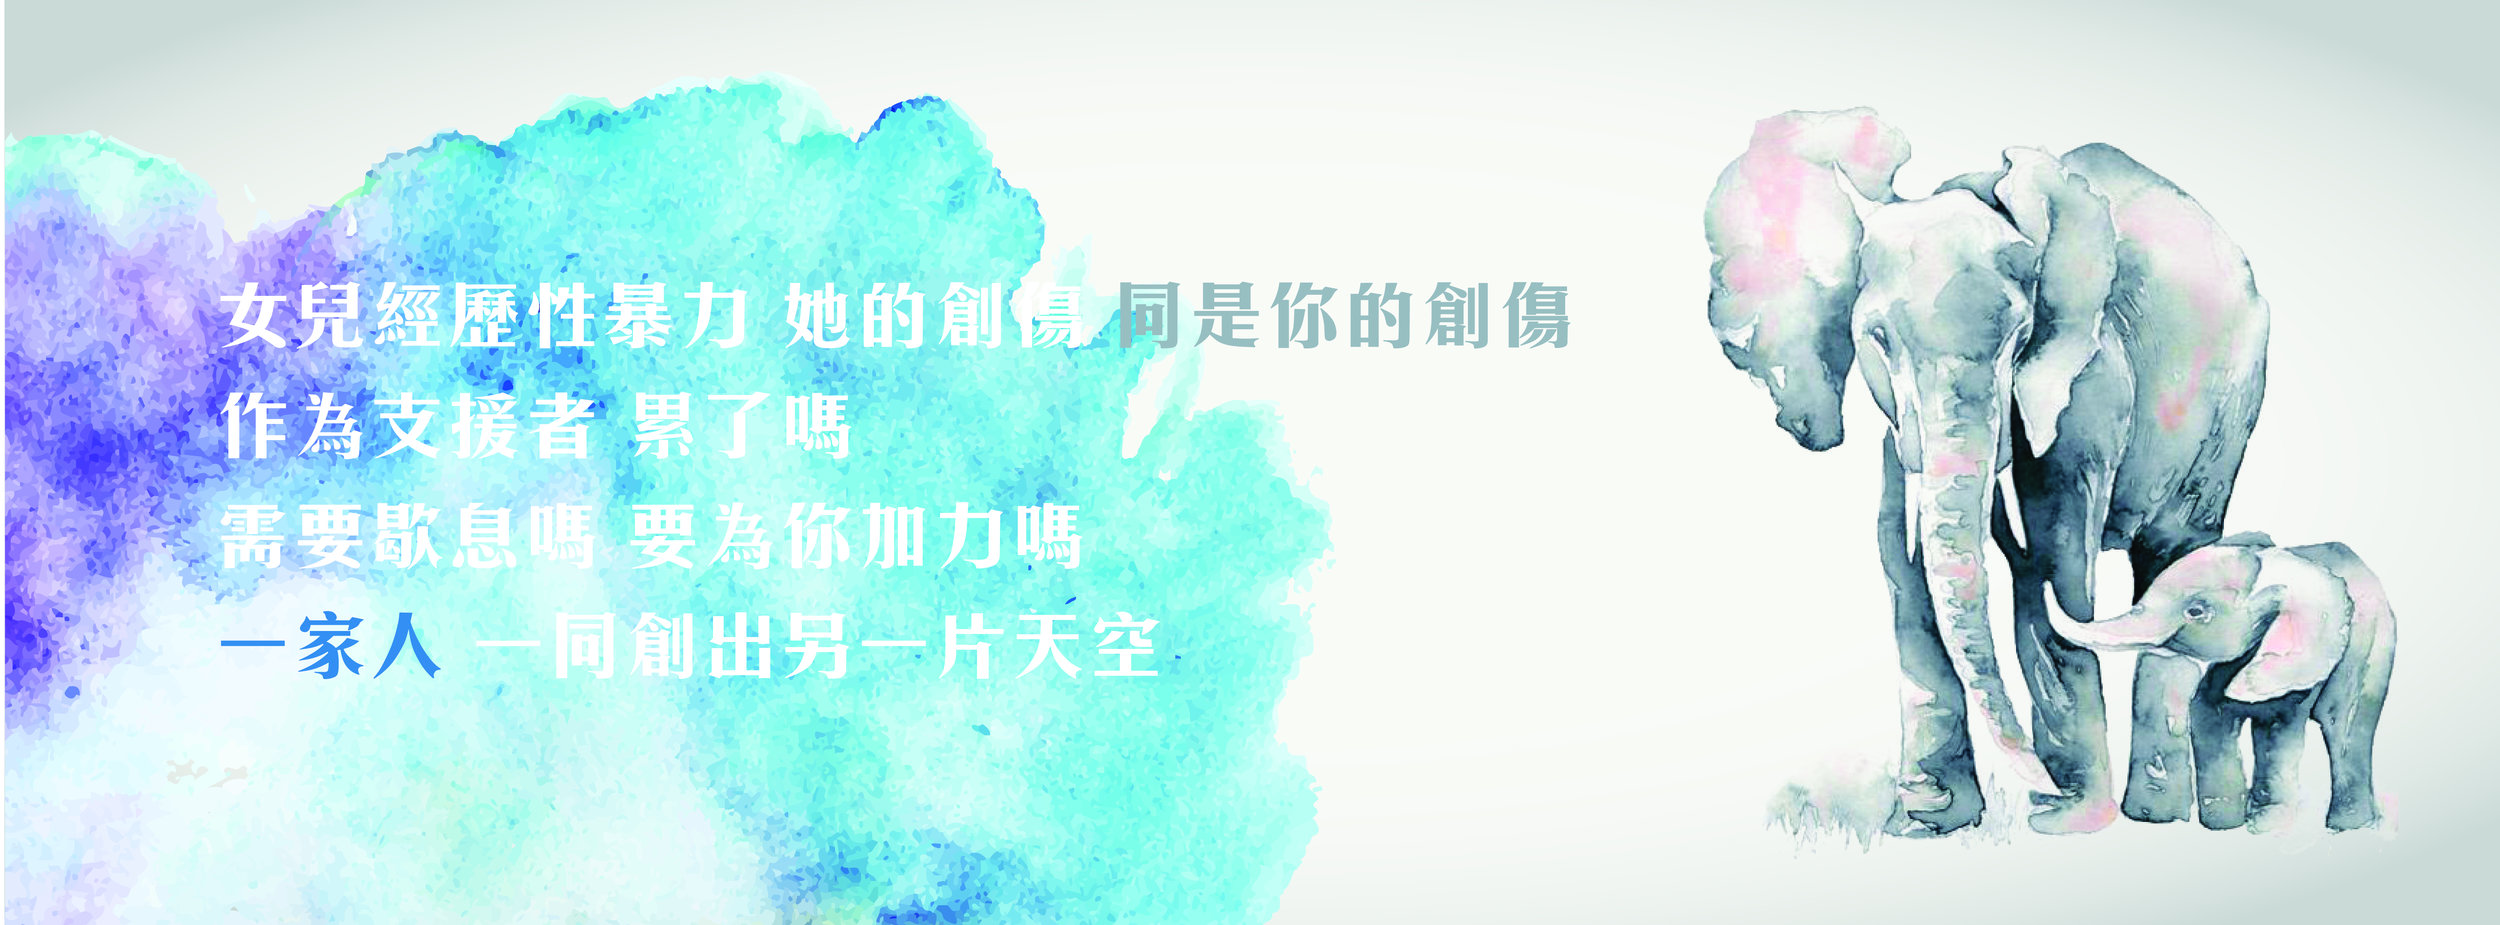 facebook event-03.jpg